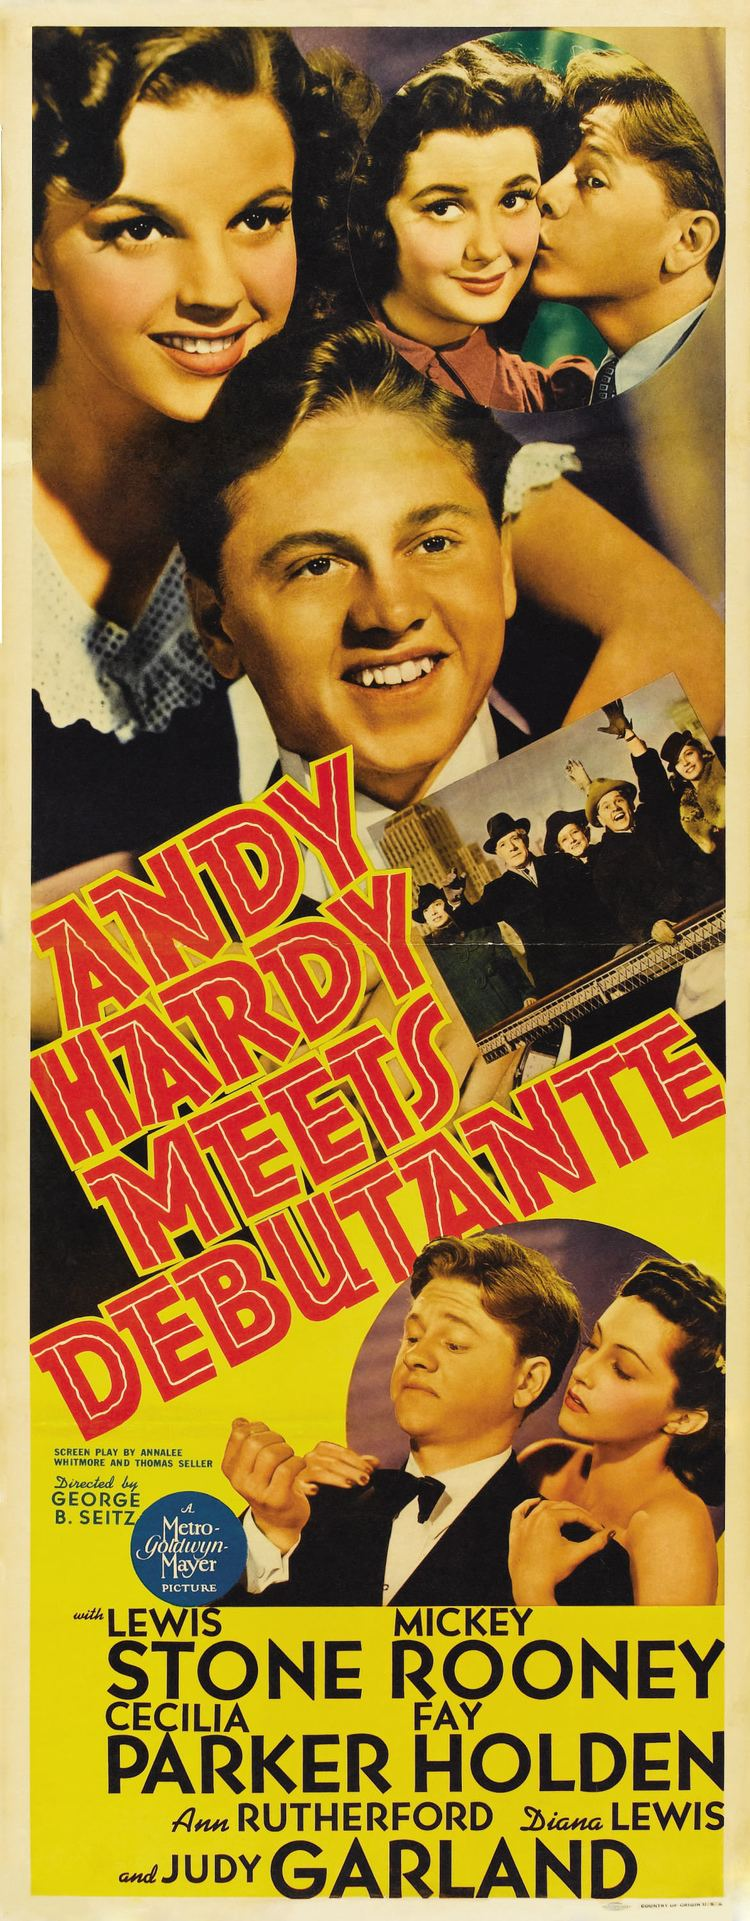 Andy Hardy Meets Debutante Andy Hardy Meets Debutante